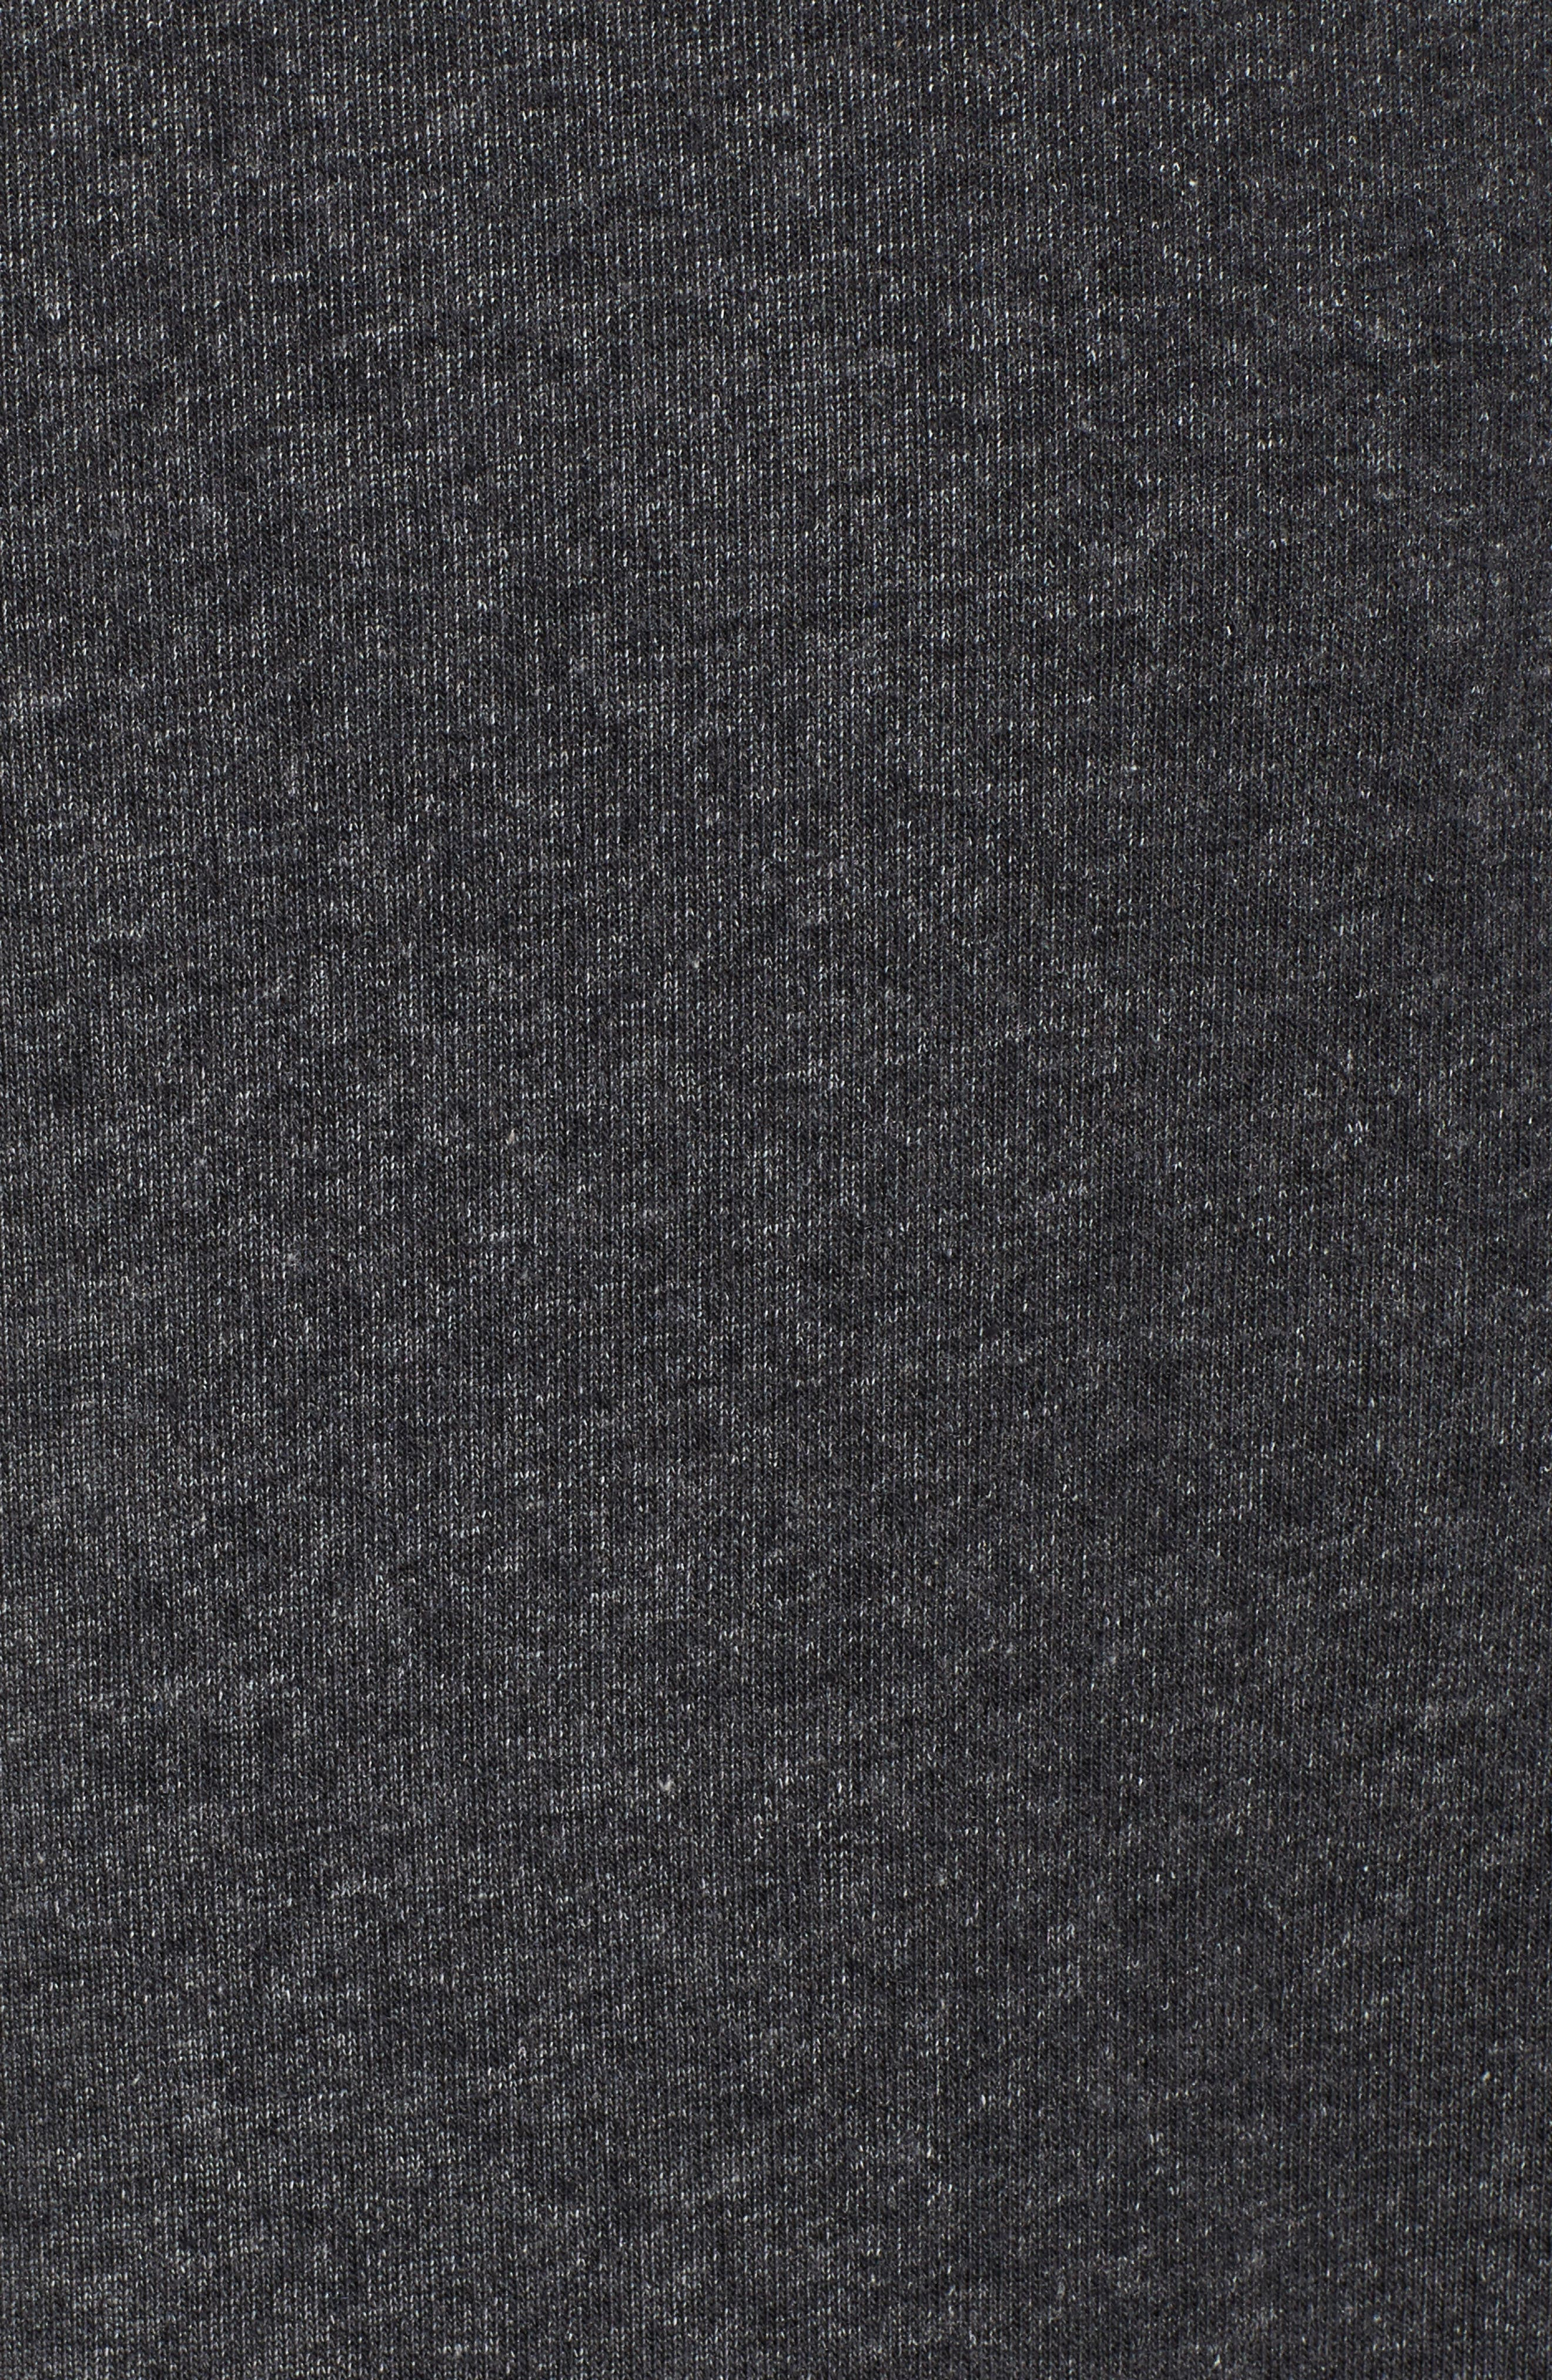 'The Champ' Sweatshirt,                             Alternate thumbnail 5, color,                             010